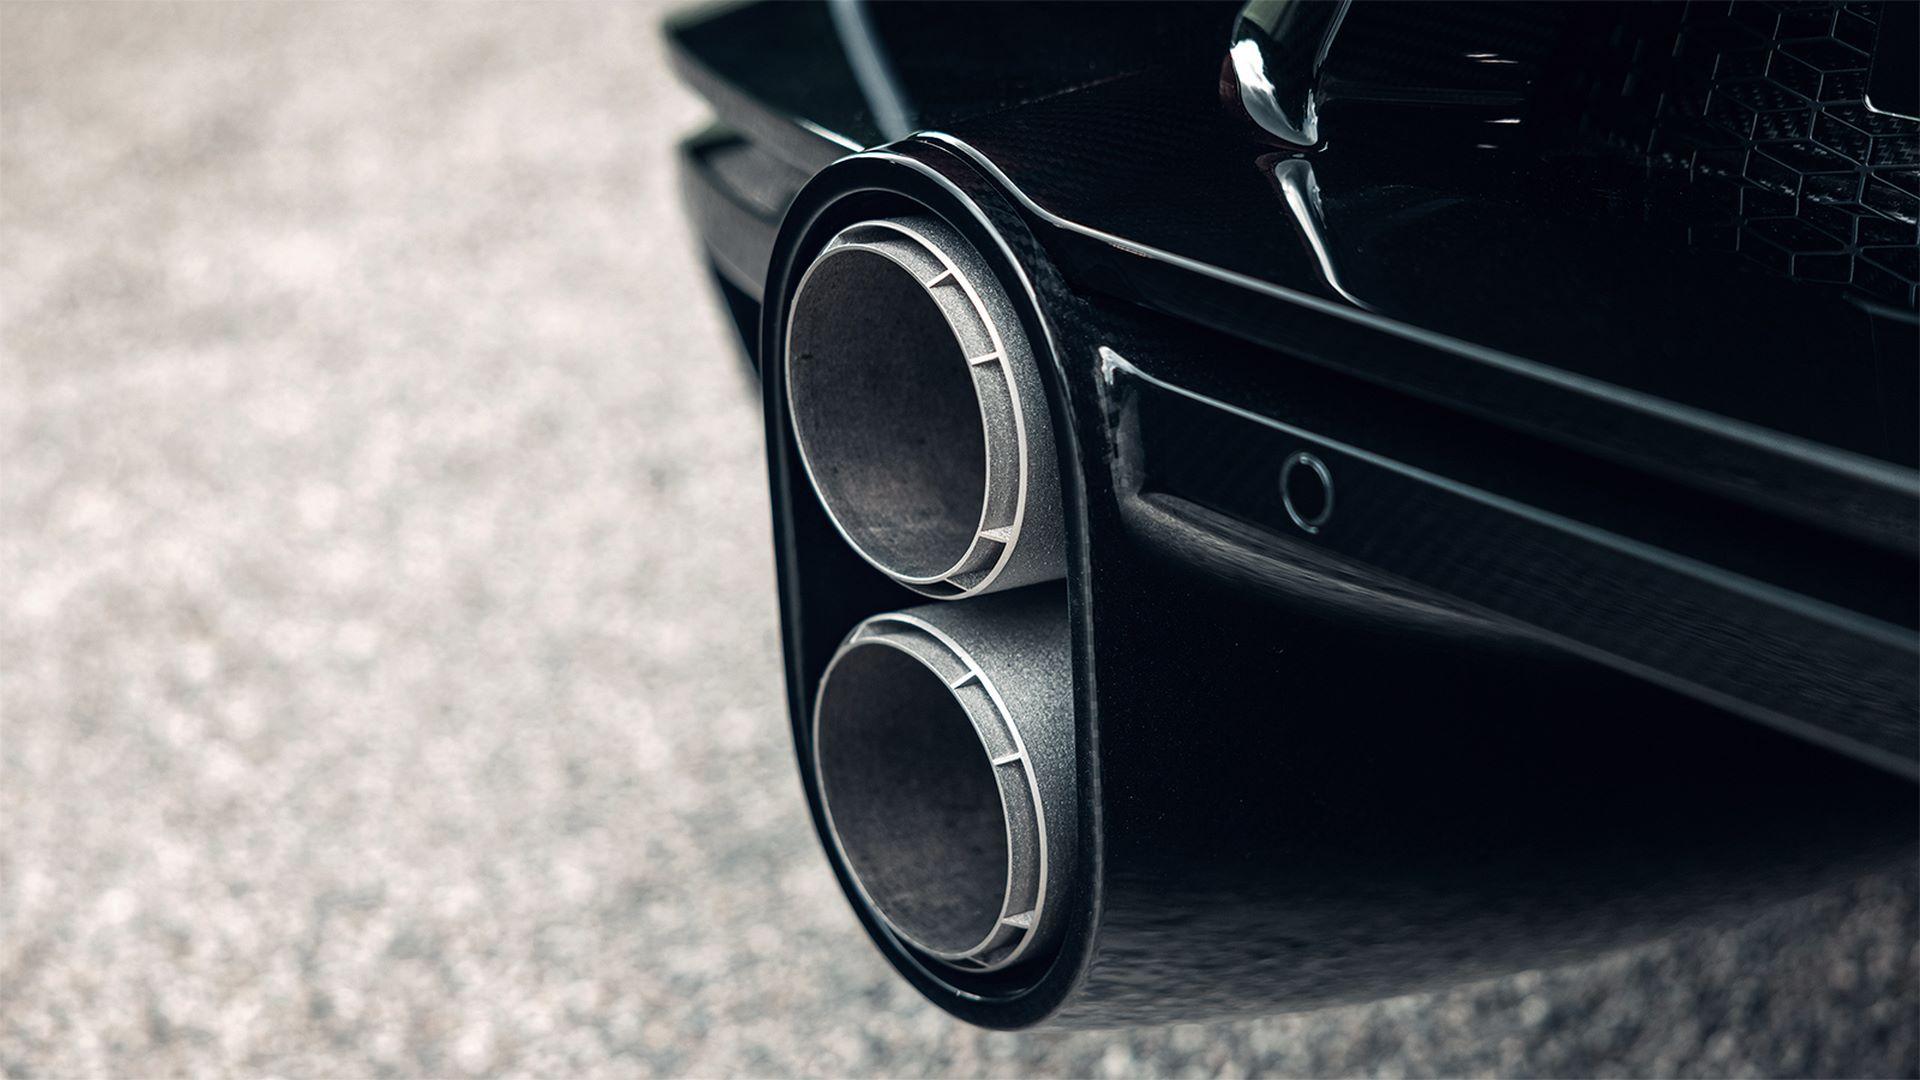 03-07_bugatti_chiron_super_sport_molsheim_front_rear_exhaust